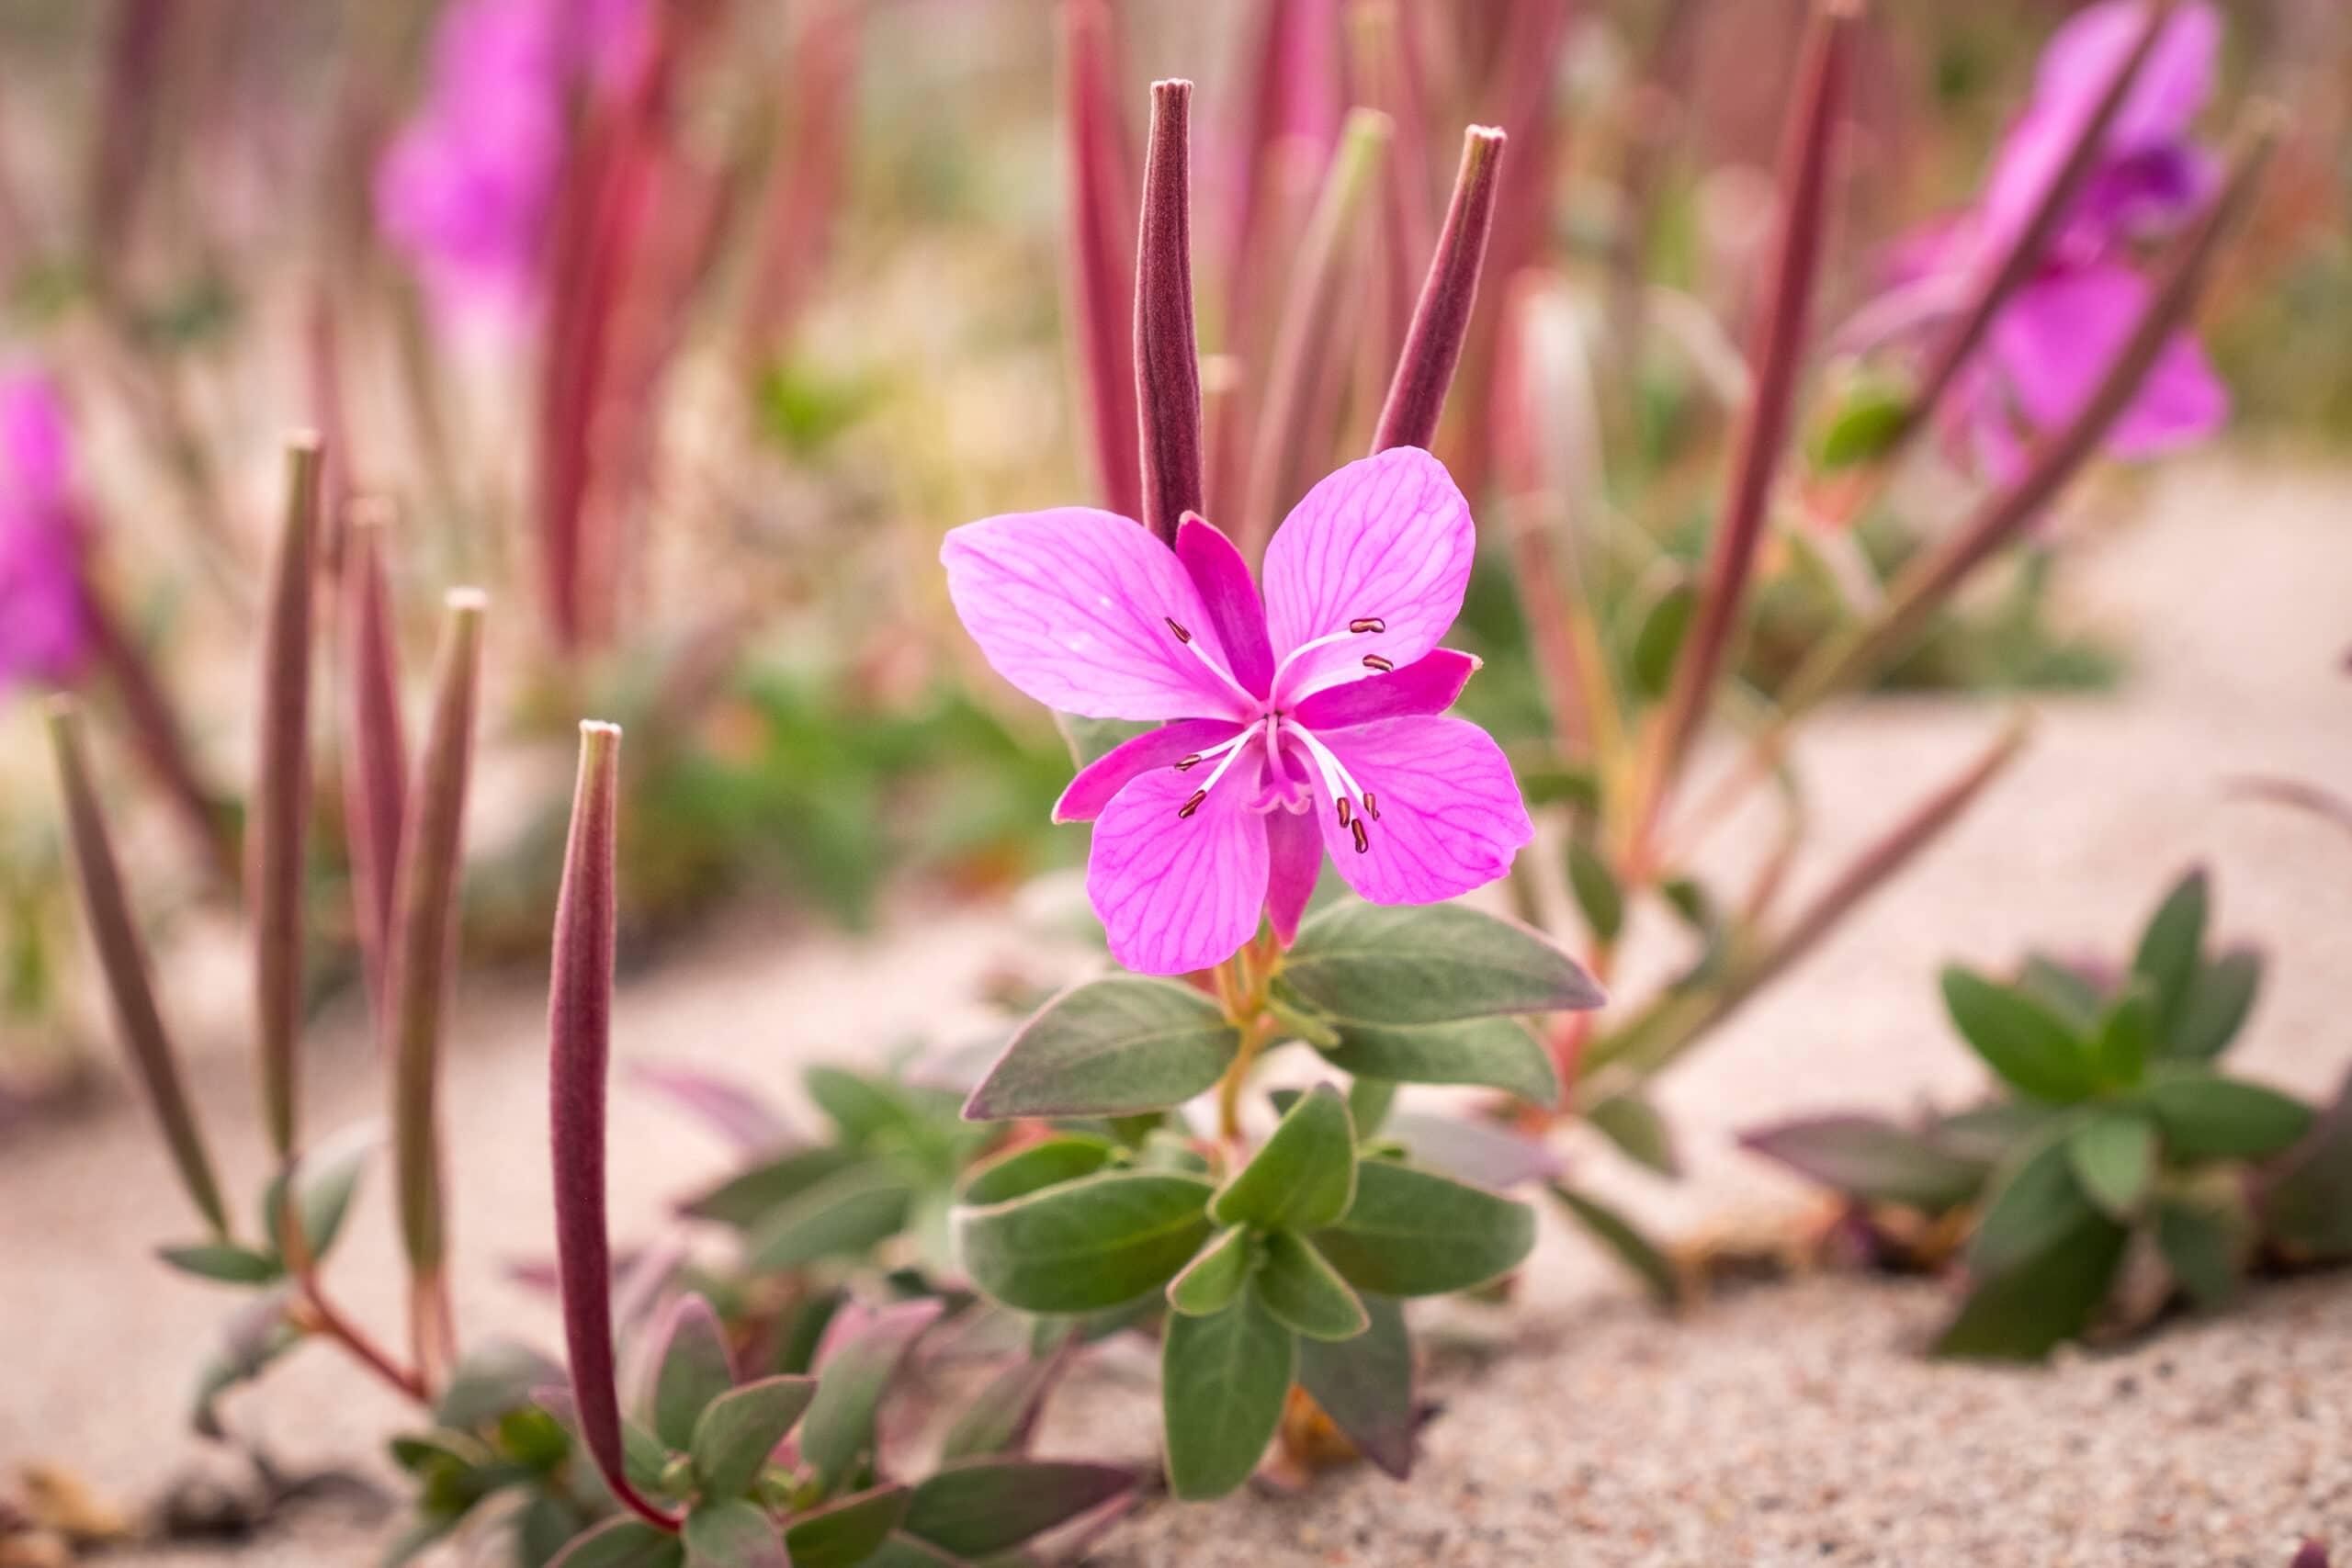 Niviarsiaq – Greenland's National Flower